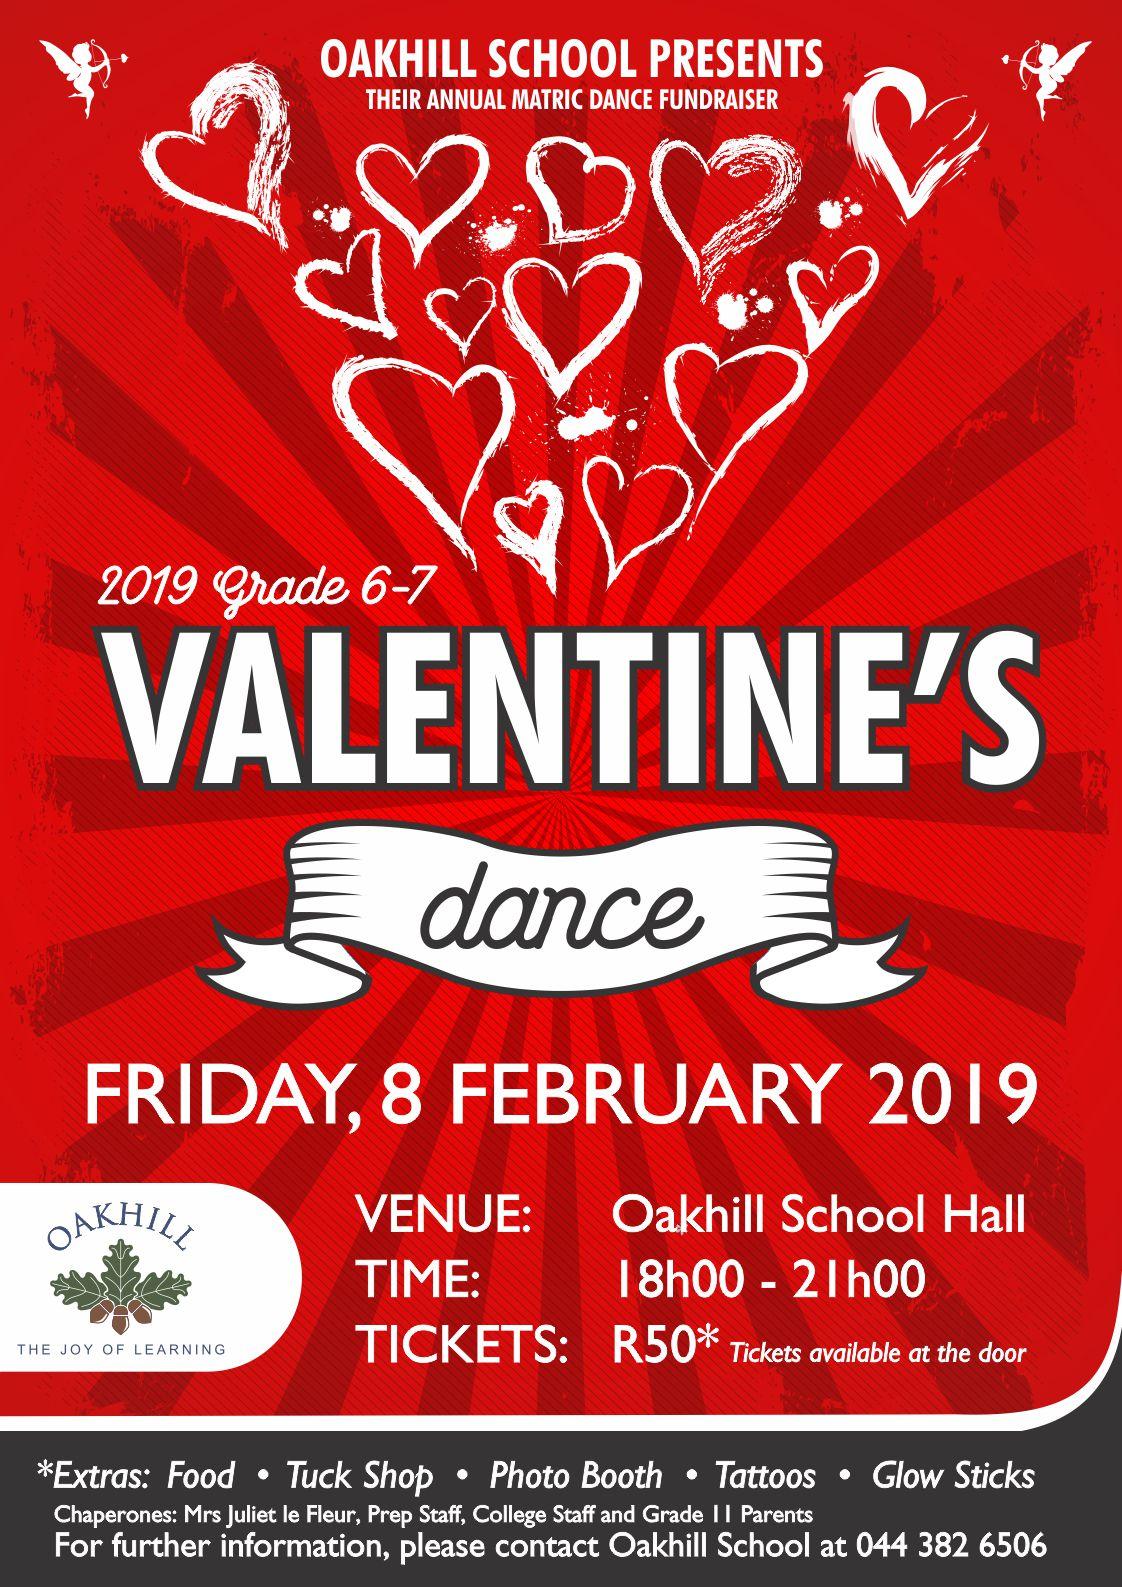 Poster_Valentines-Dance-2019